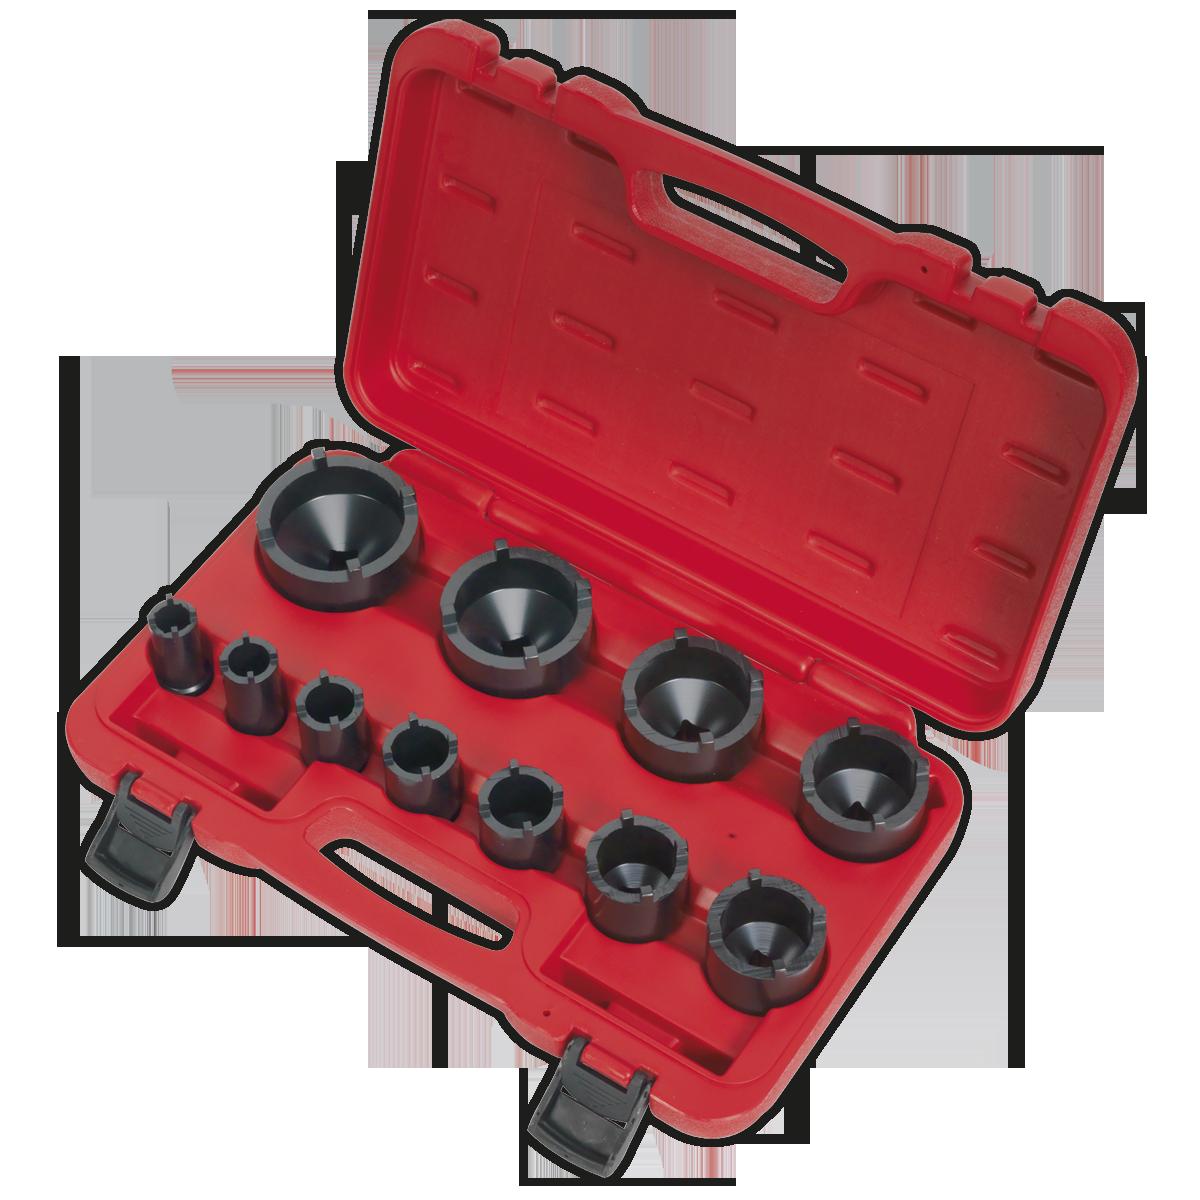 "Ball Joint Socket Set 11pc 1/2""Sq Drive"